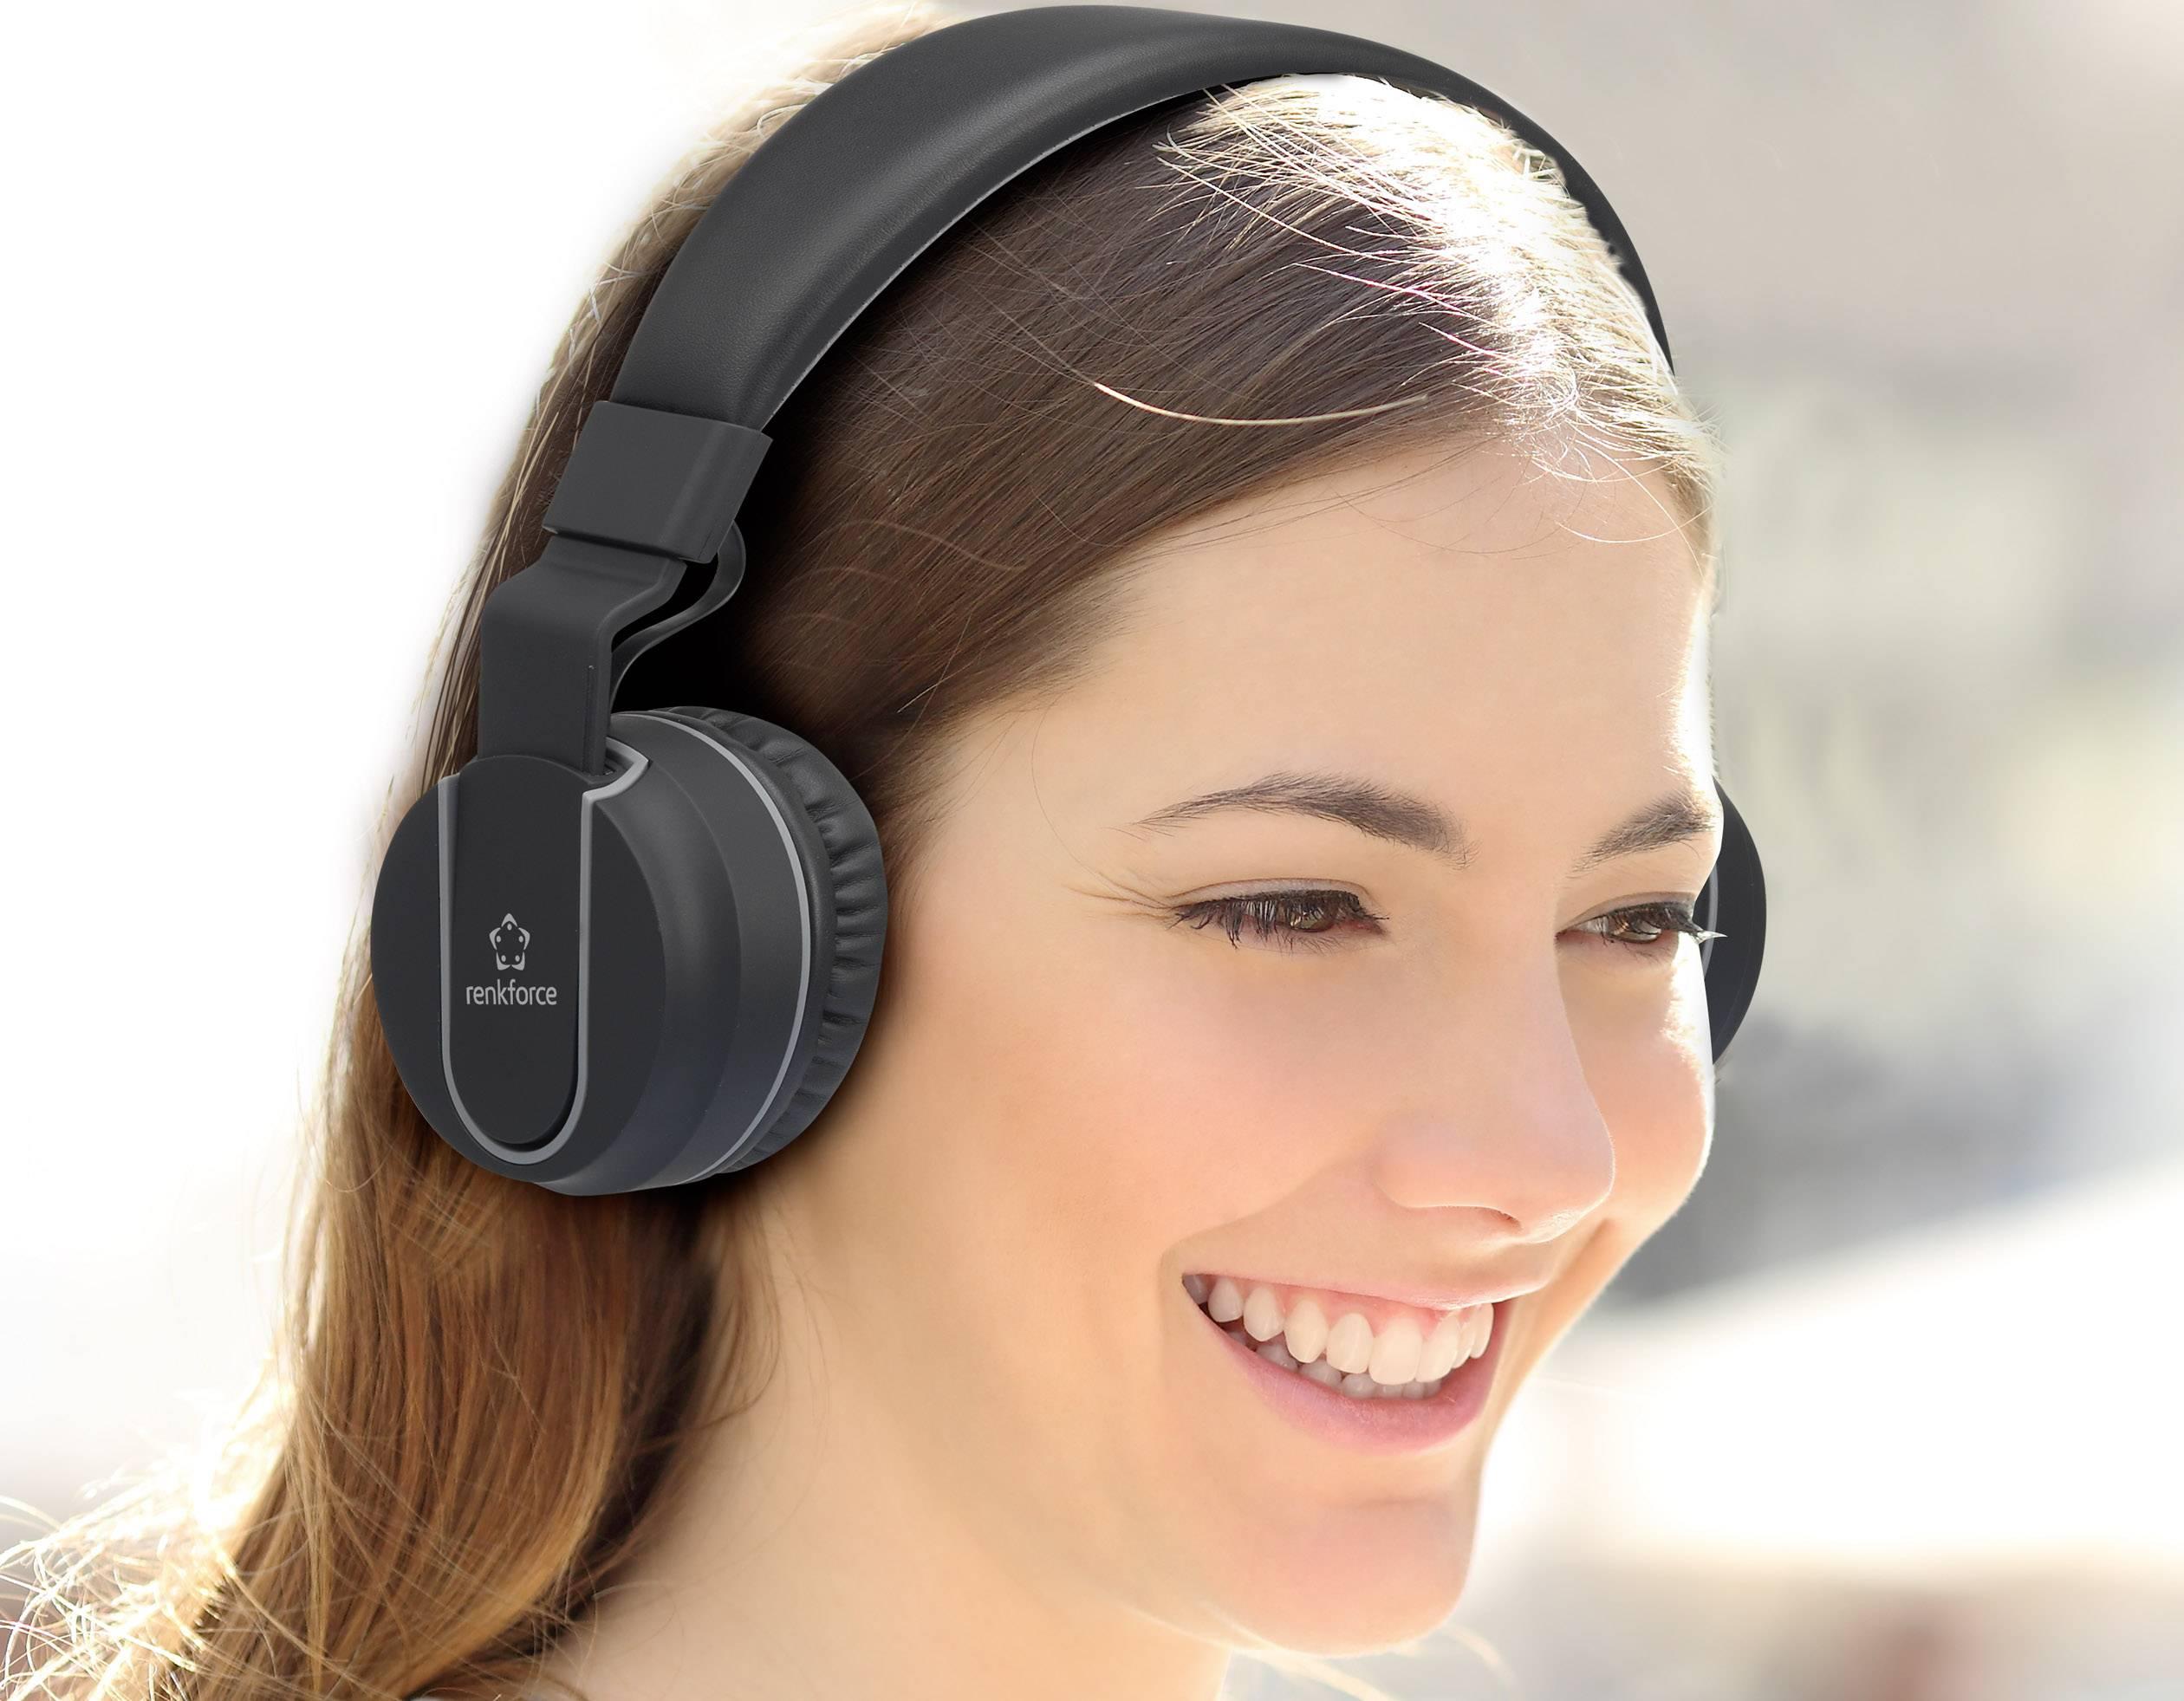 Renkforce RF-BTK-100 Bluetooth® HiFi on ear stereo-headset na ušima slušalice s mikrofonom, sklopive crna, siva